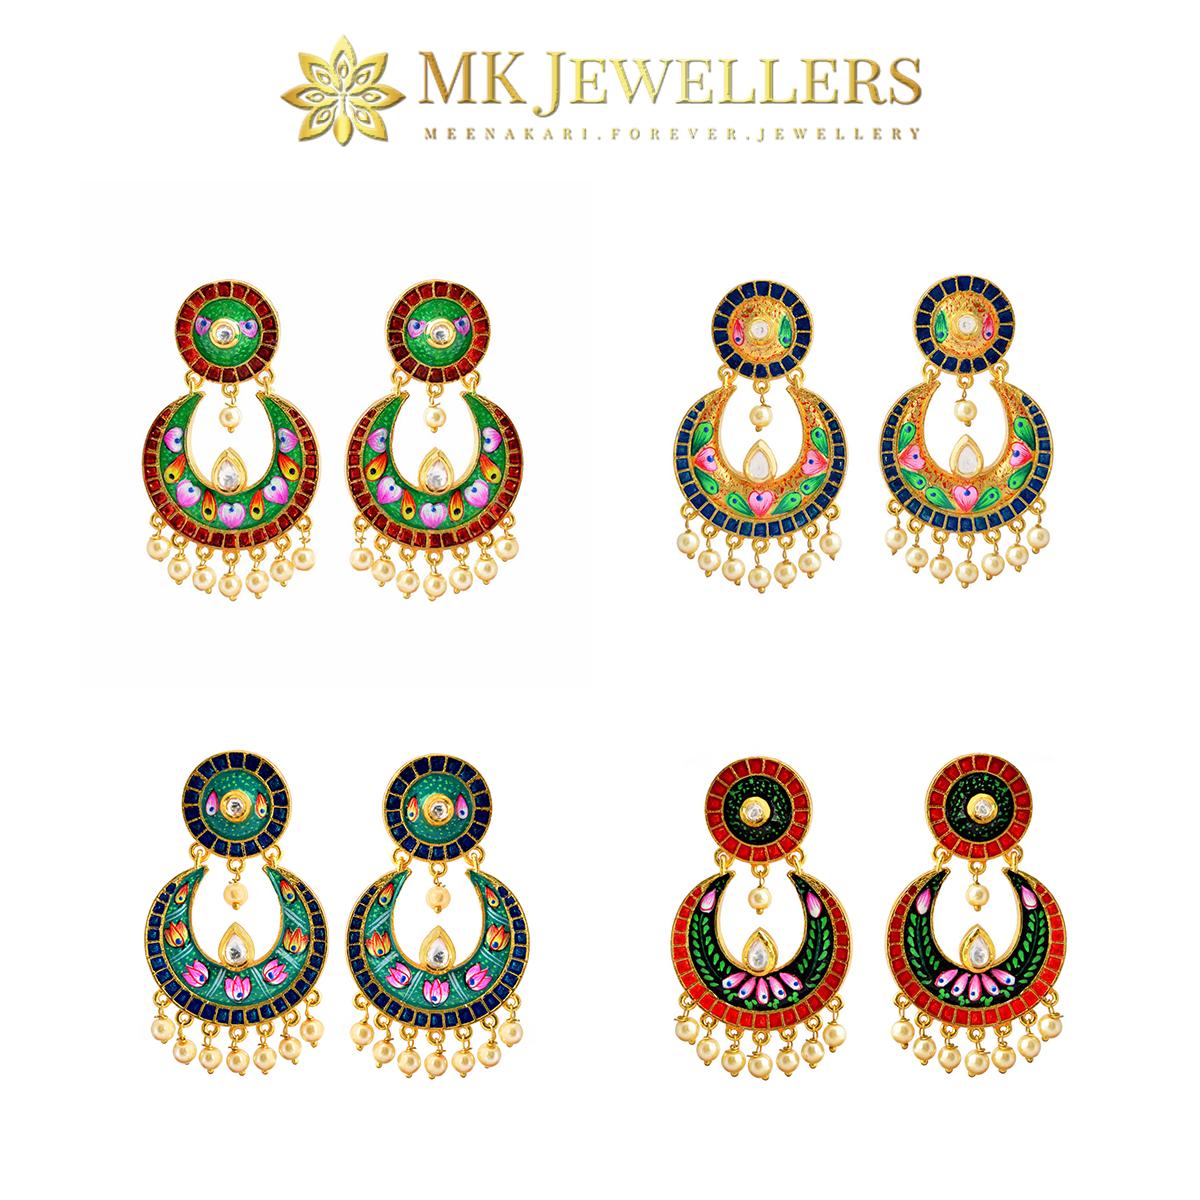 MK Jewellers is the best kundan and meenakari jewellery